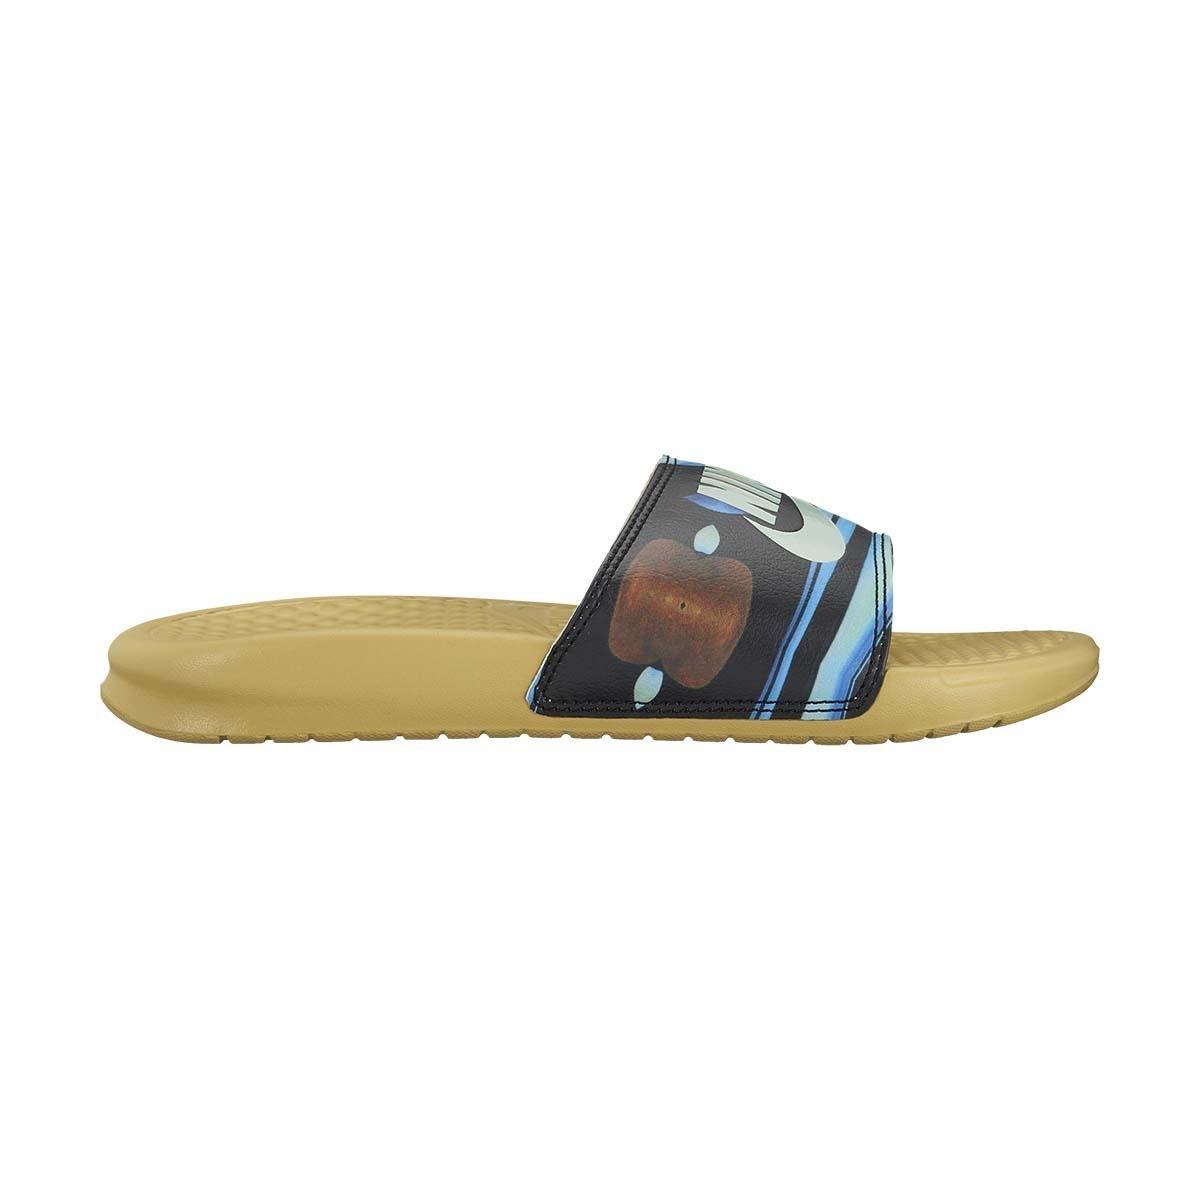 Nike Women's Benassi ''Just Do It.'' Sandal nk618919-700 (Buff Gold/Igloo-buff Gold, 7 B(M) US) by NIKE